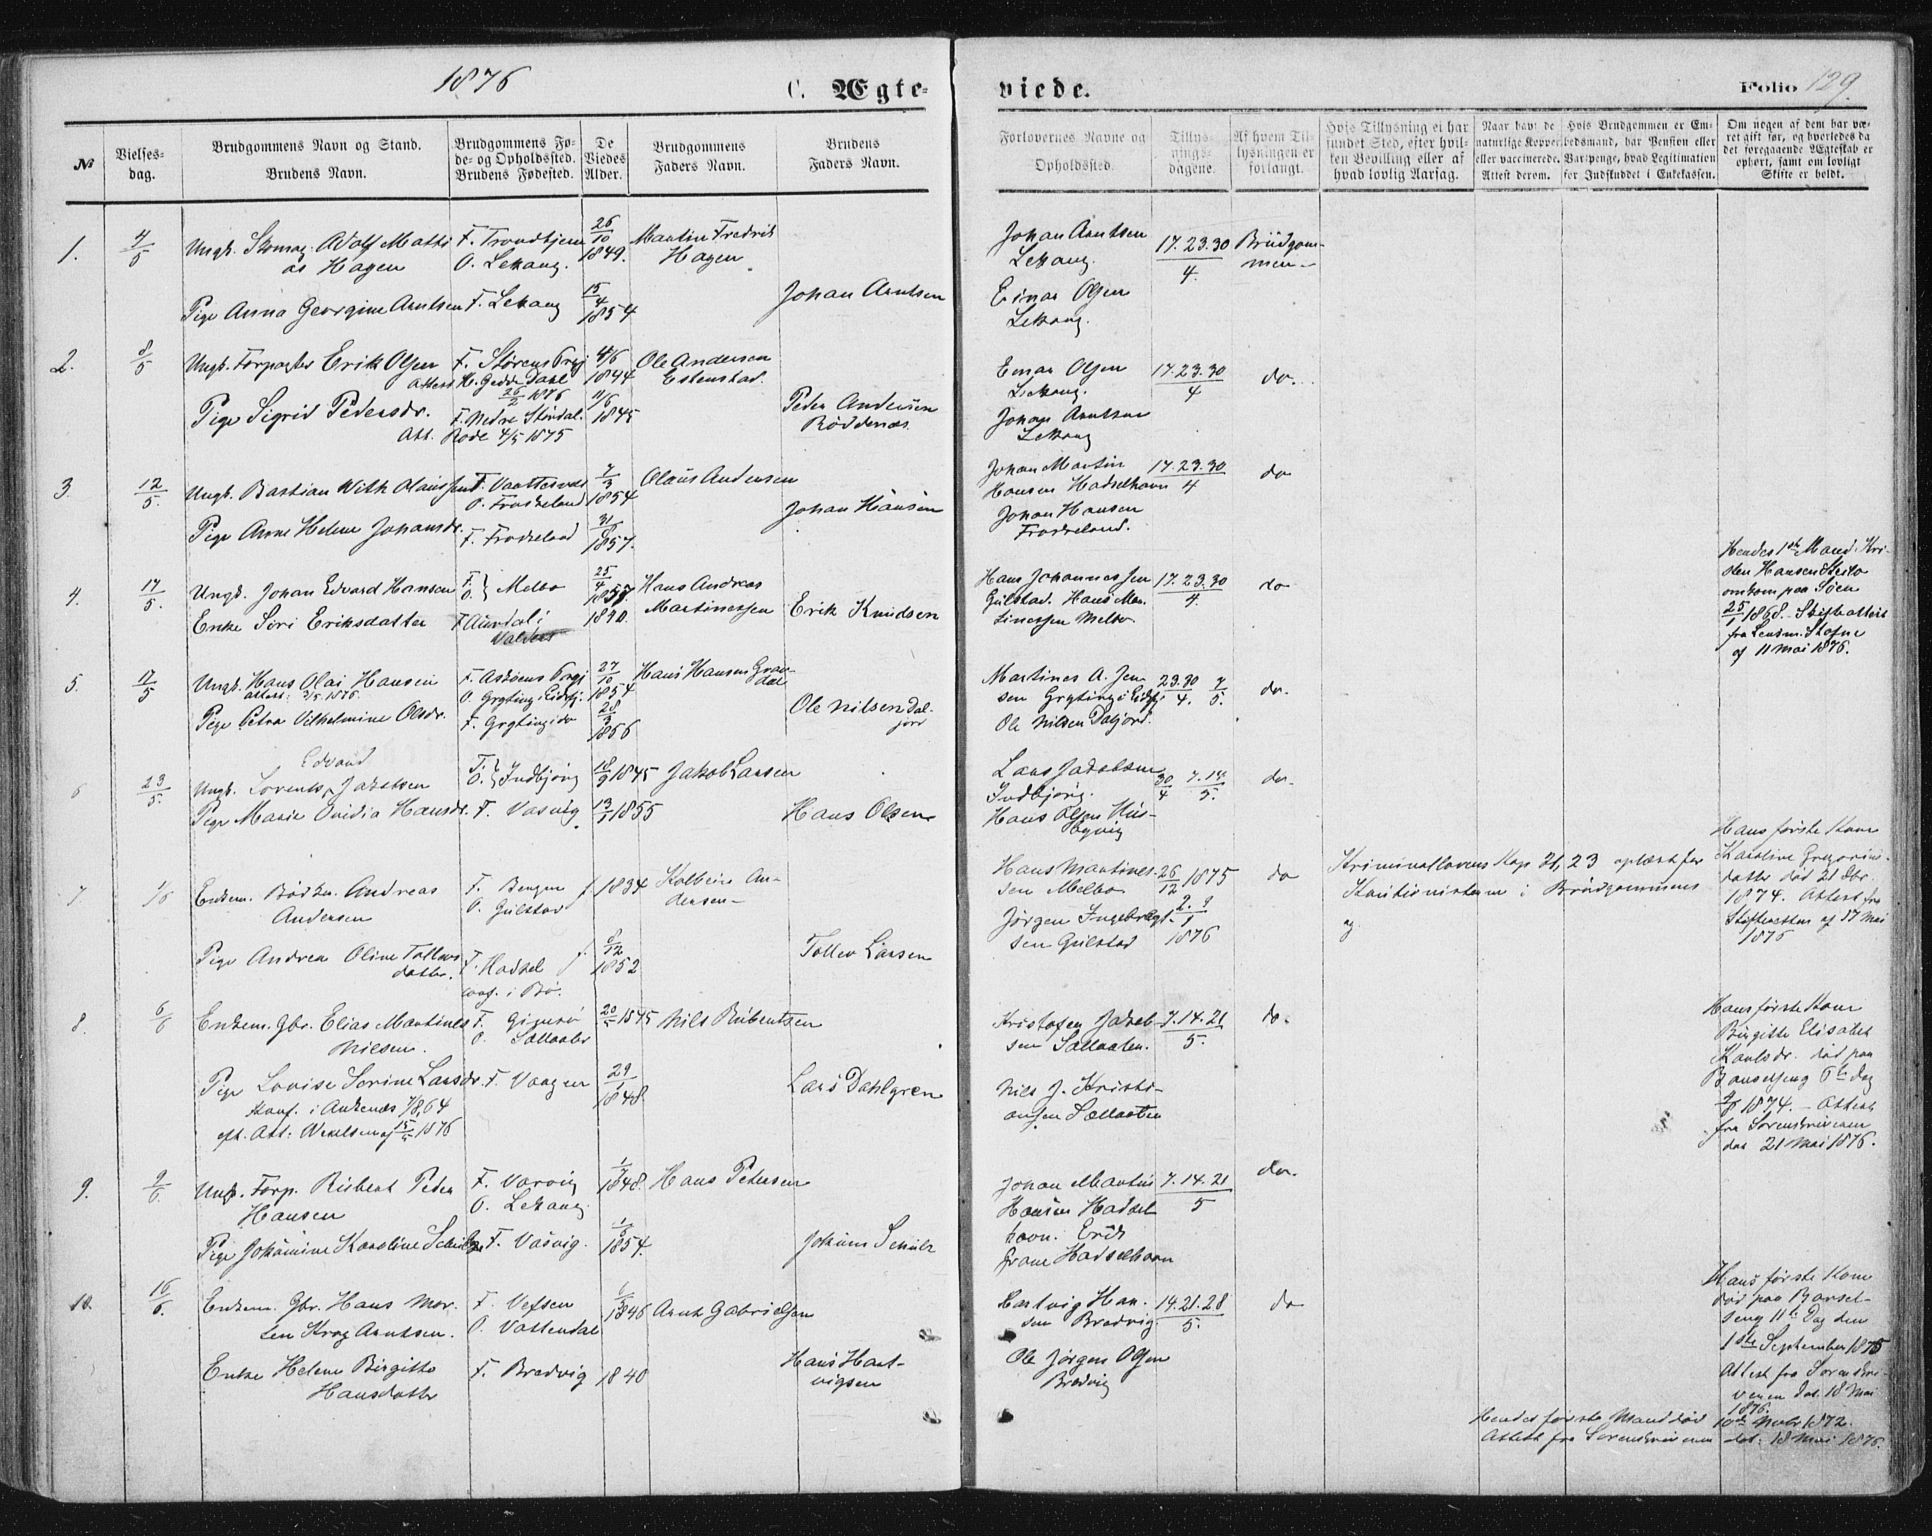 SAT, Ministerialprotokoller, klokkerbøker og fødselsregistre - Nordland, 888/L1243: Ministerialbok nr. 888A09, 1876-1879, s. 129